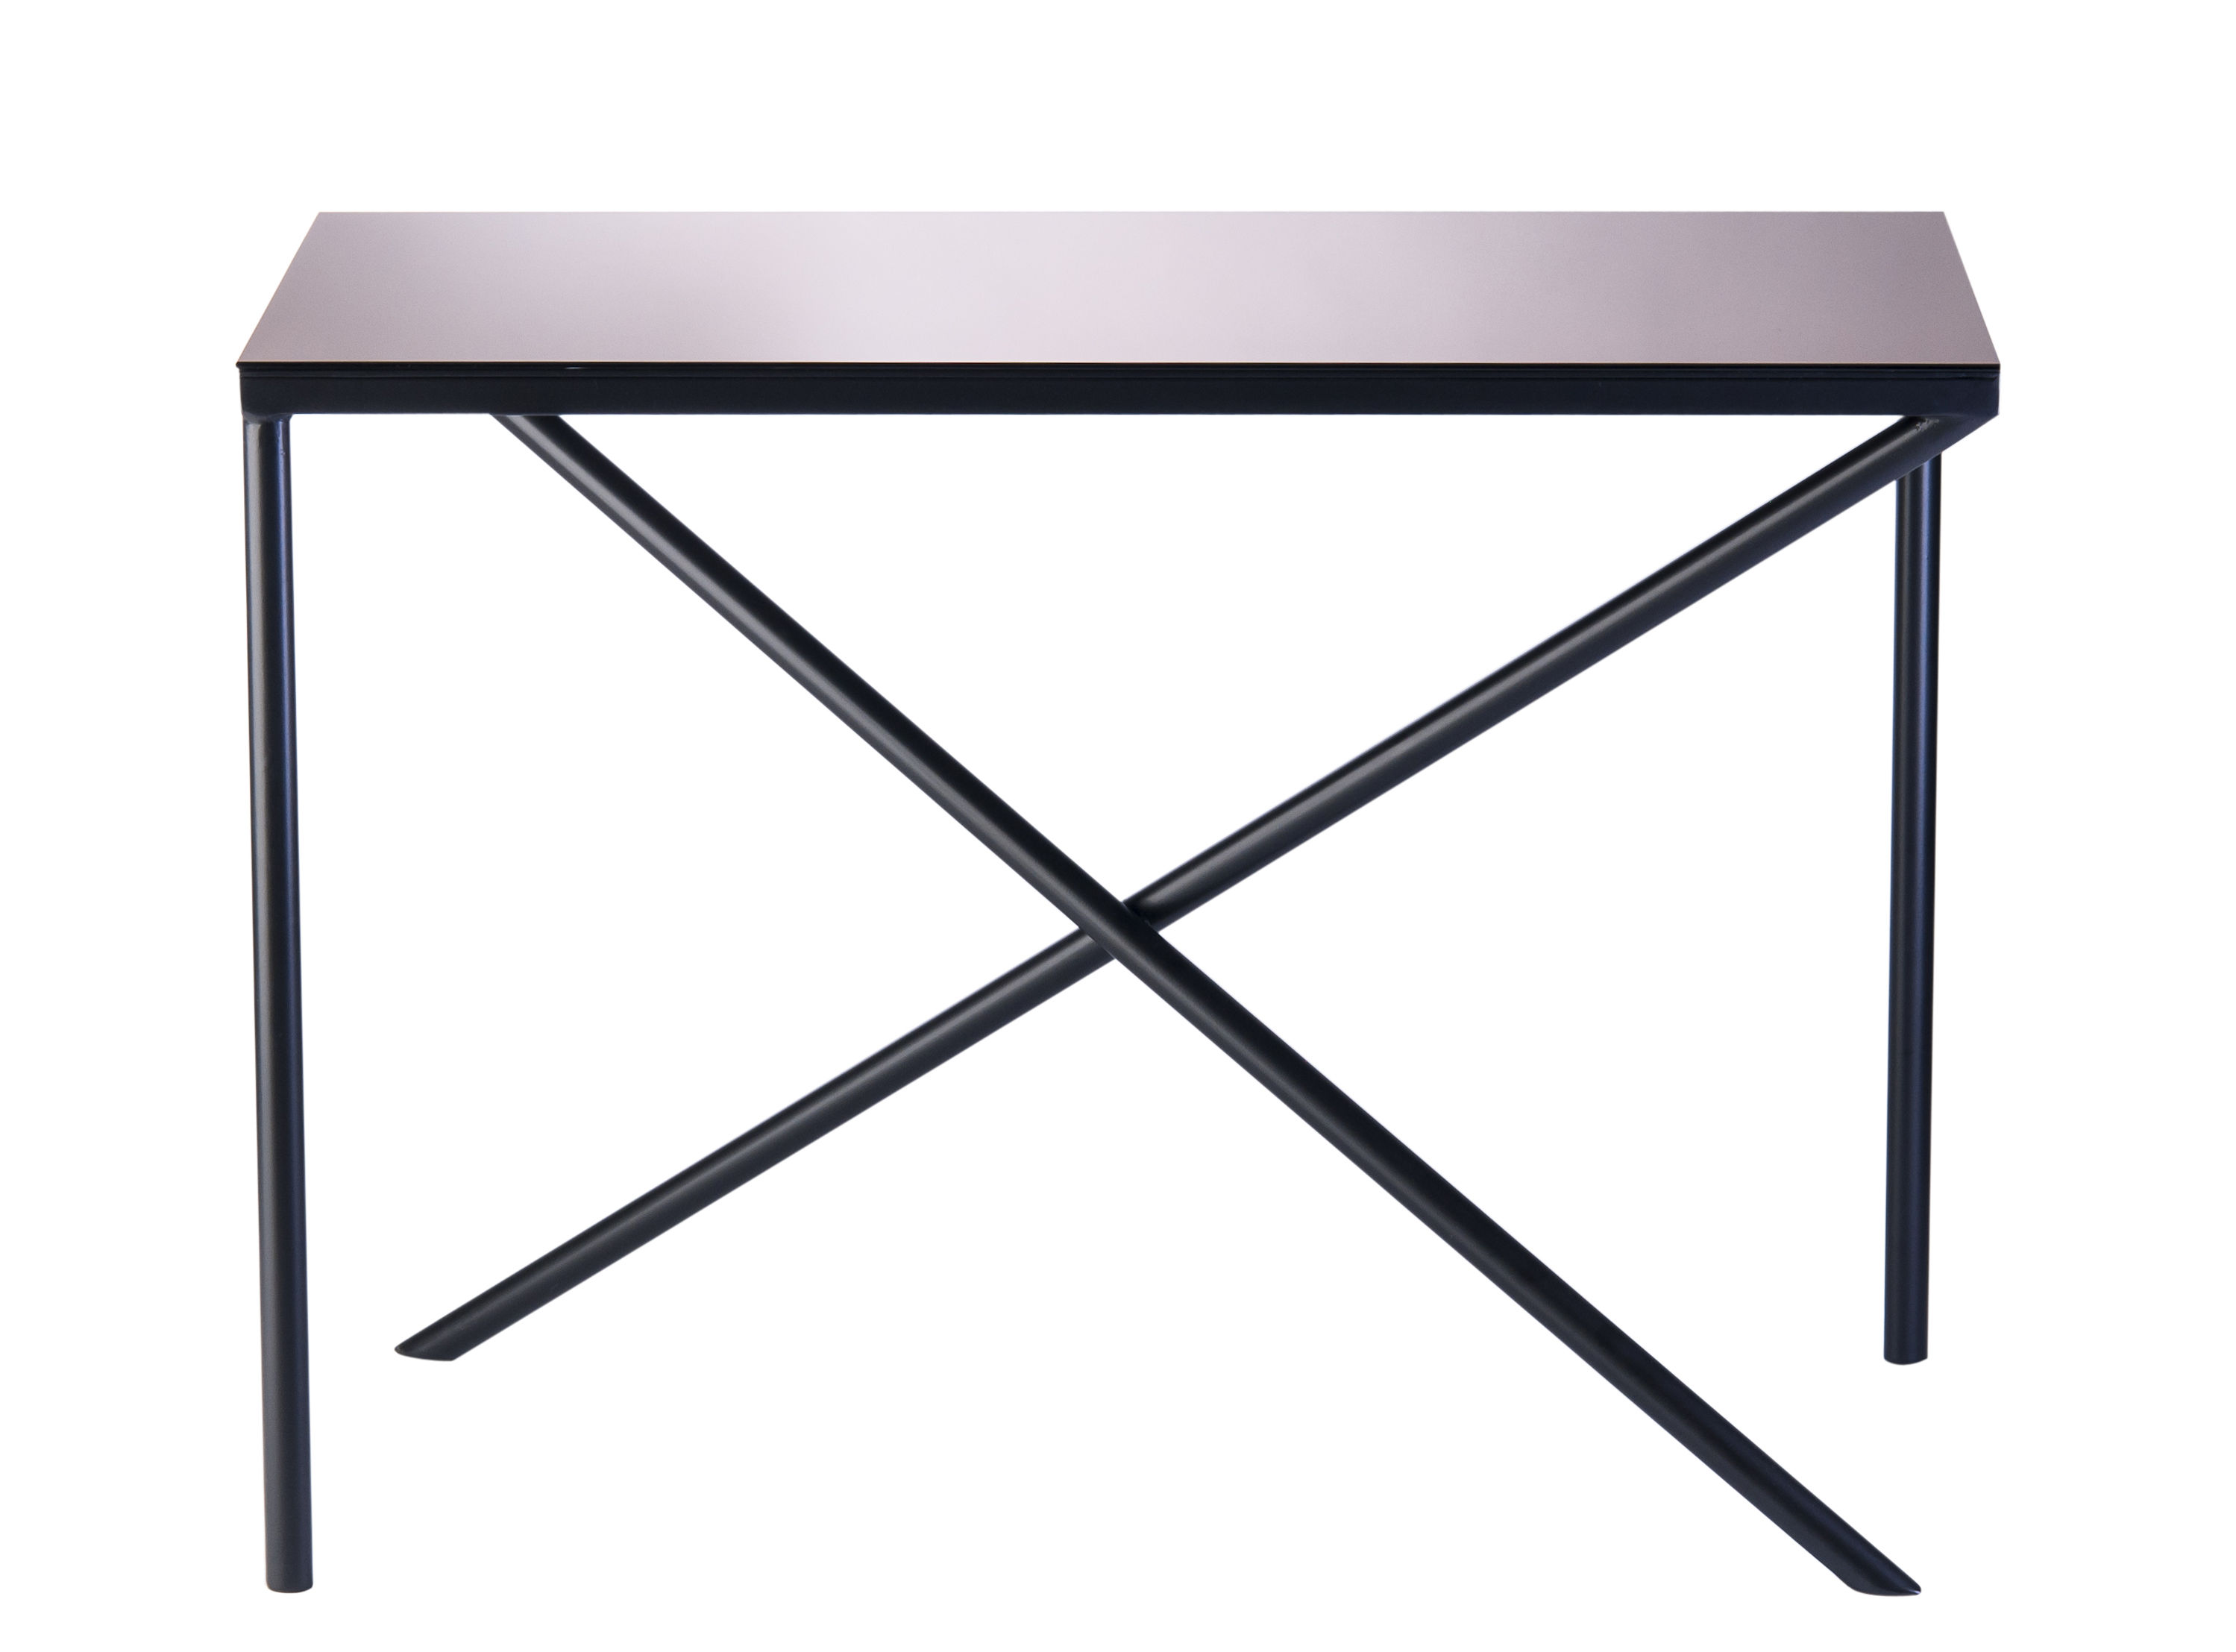 Illusion Coffee Table H 65 Cm Bronze Mirror Legs